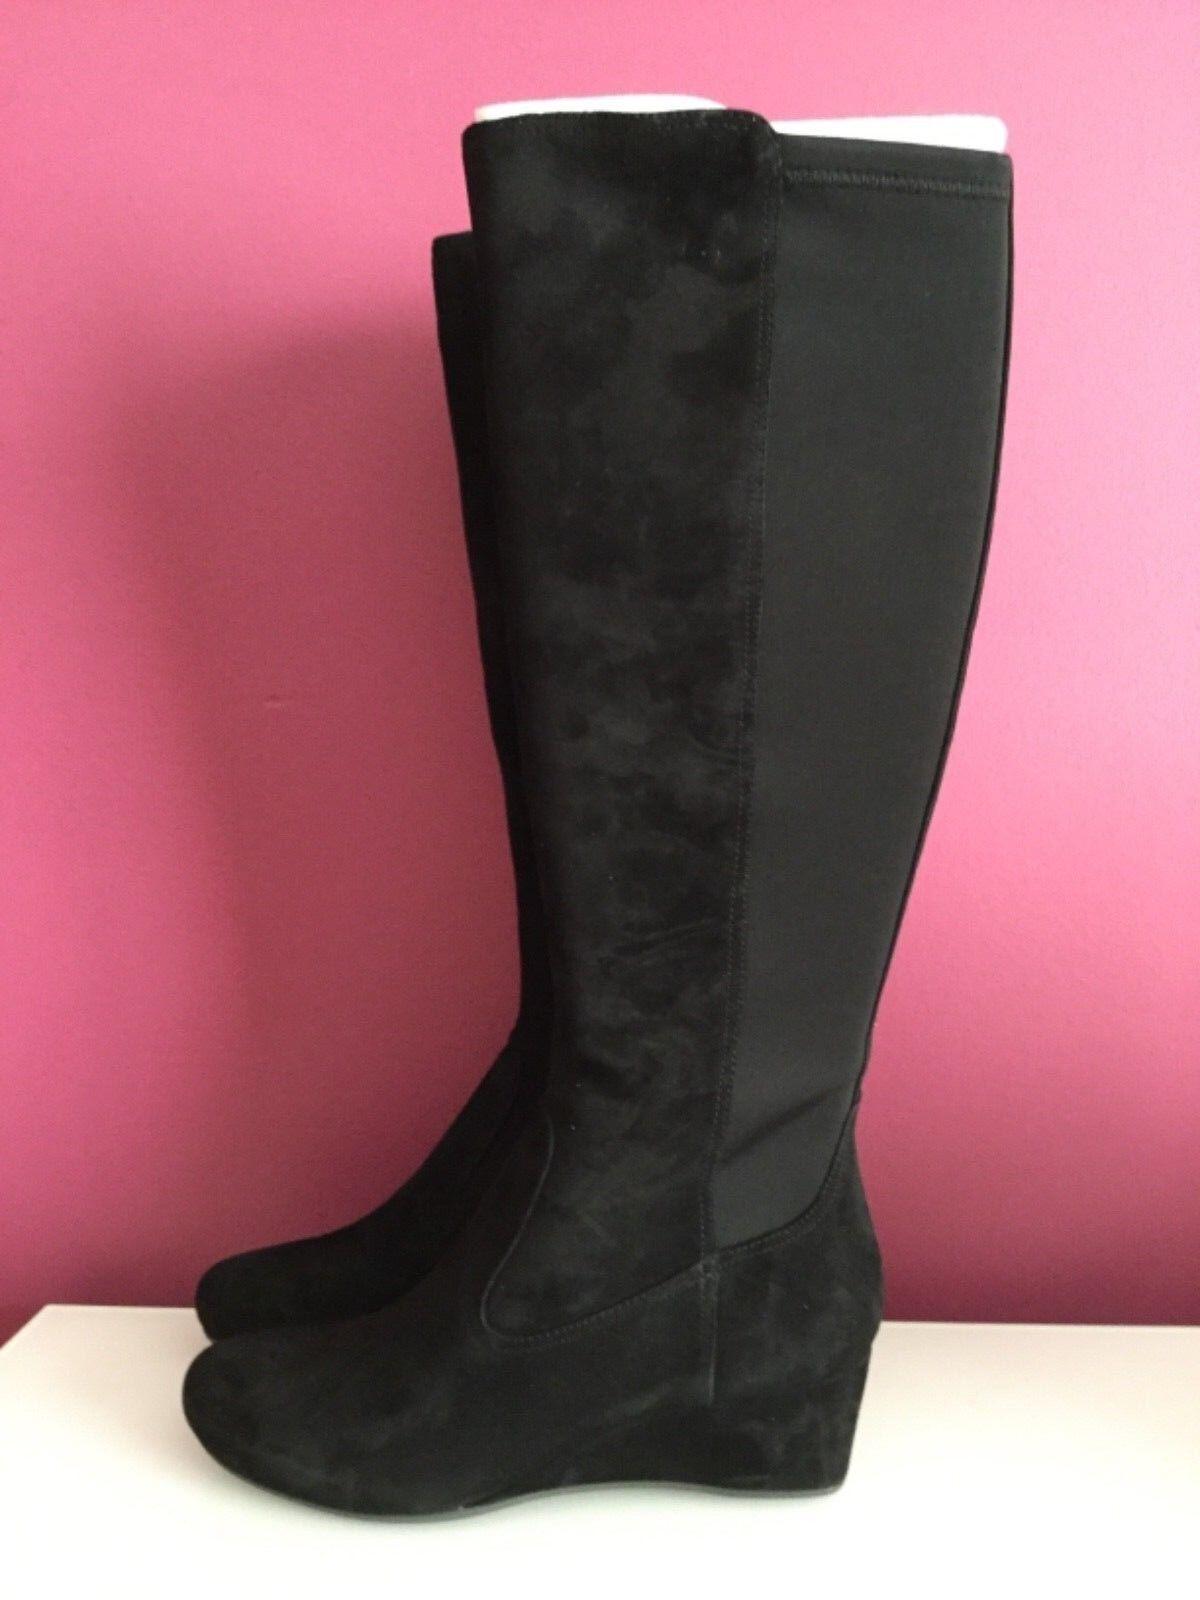 Mujeres Rockport Total Motion 45 mm de alto botas talla 8